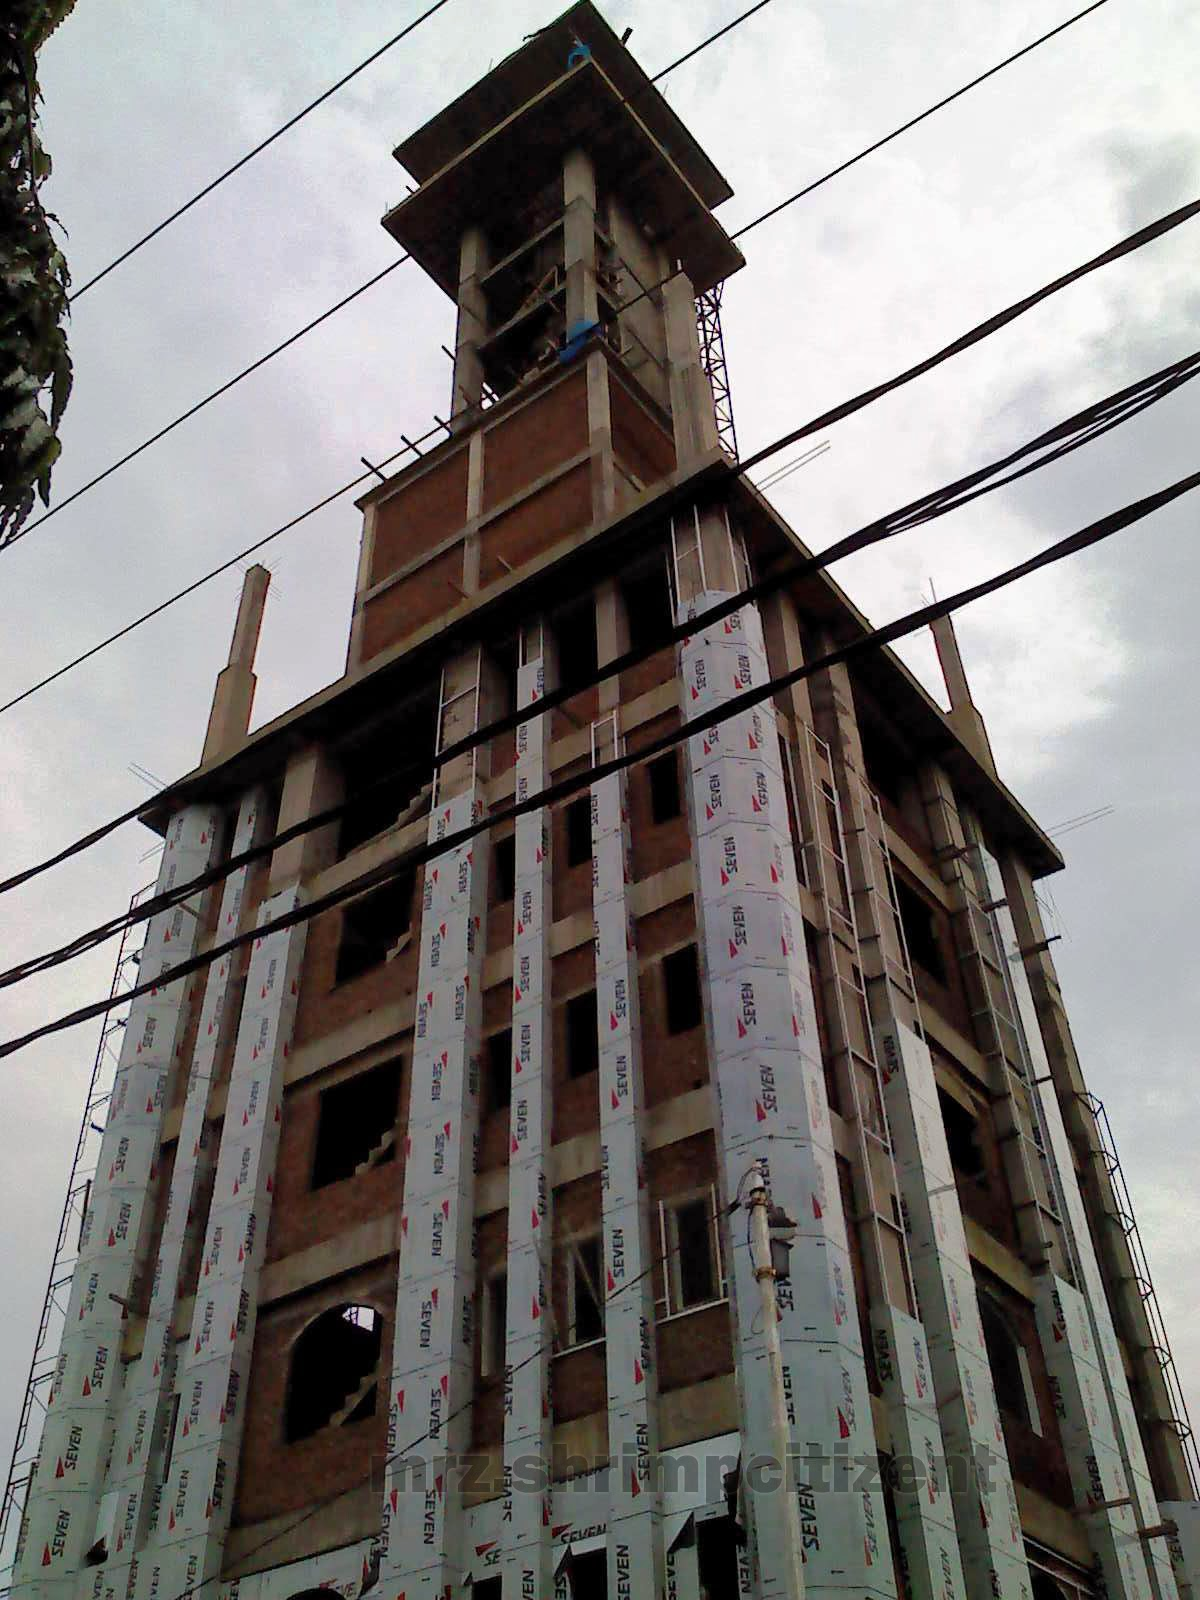 Pembangunan Menara Masjid Agung Sumber, Kab. Cirebon 1